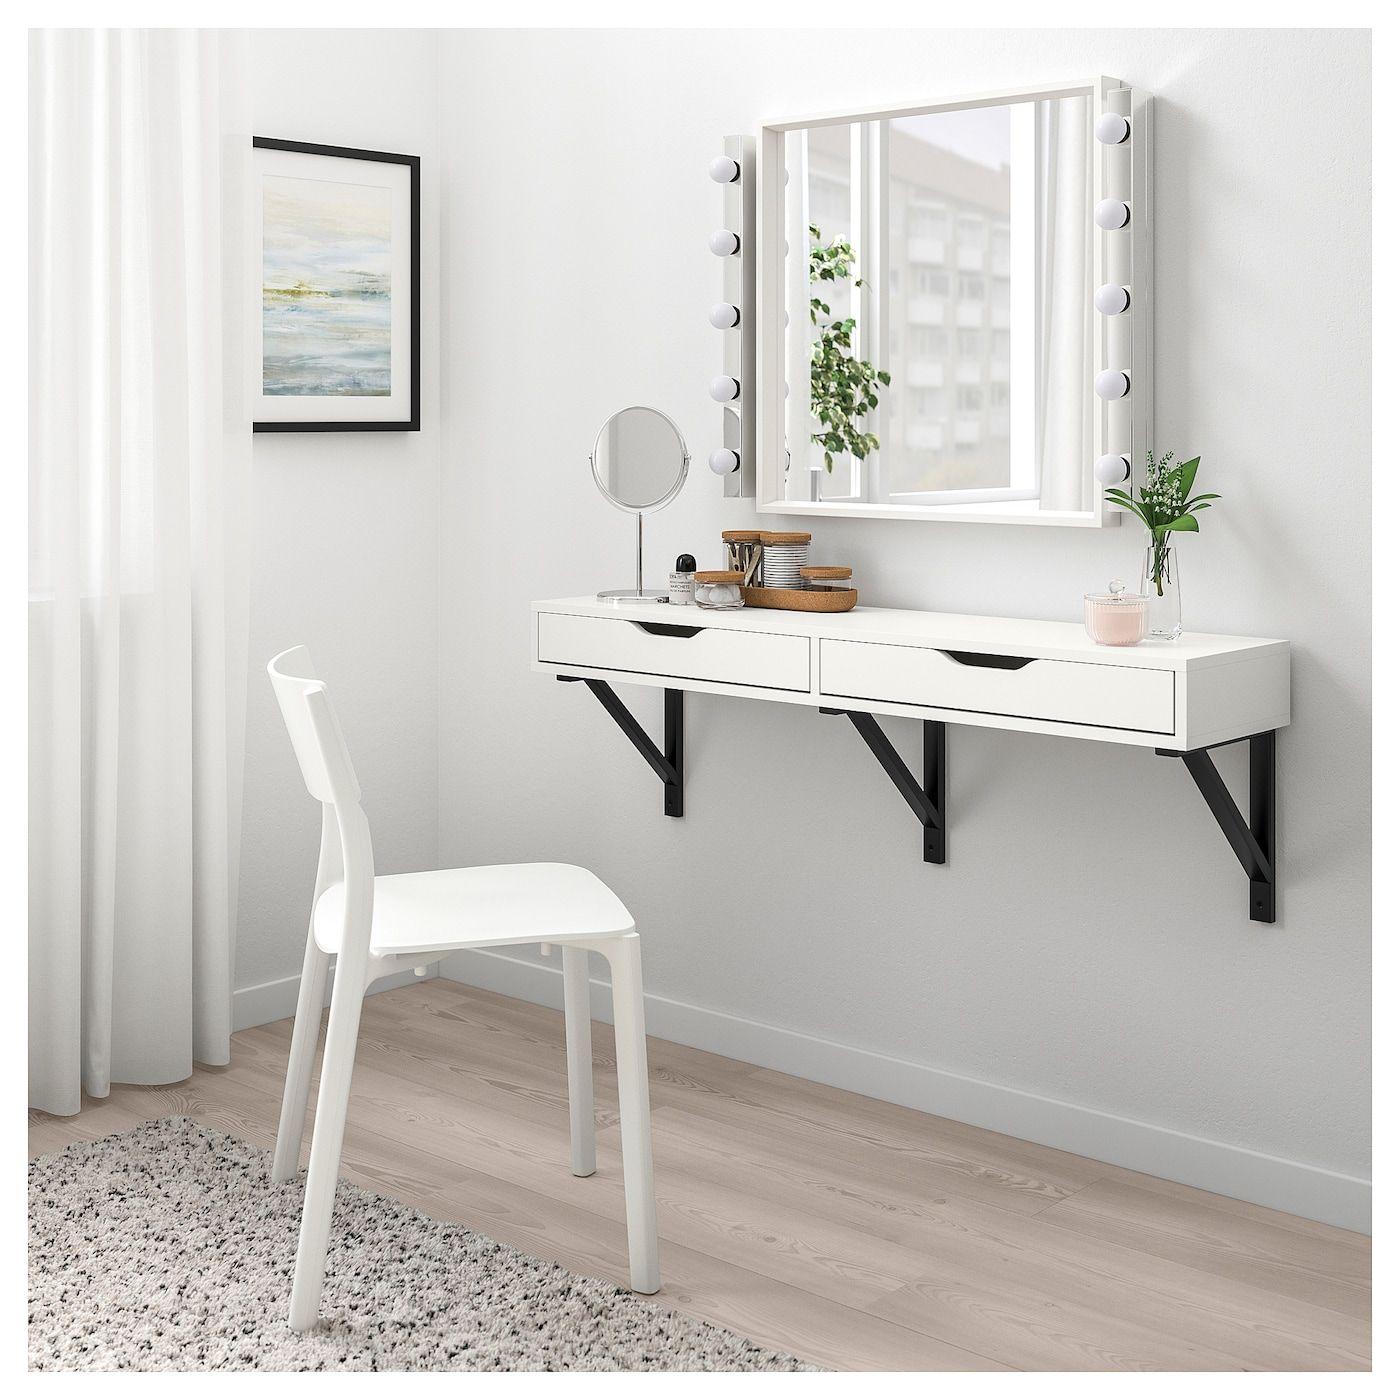 Ikea Us Furniture And Home Furnishings Wall Shelf With Drawer